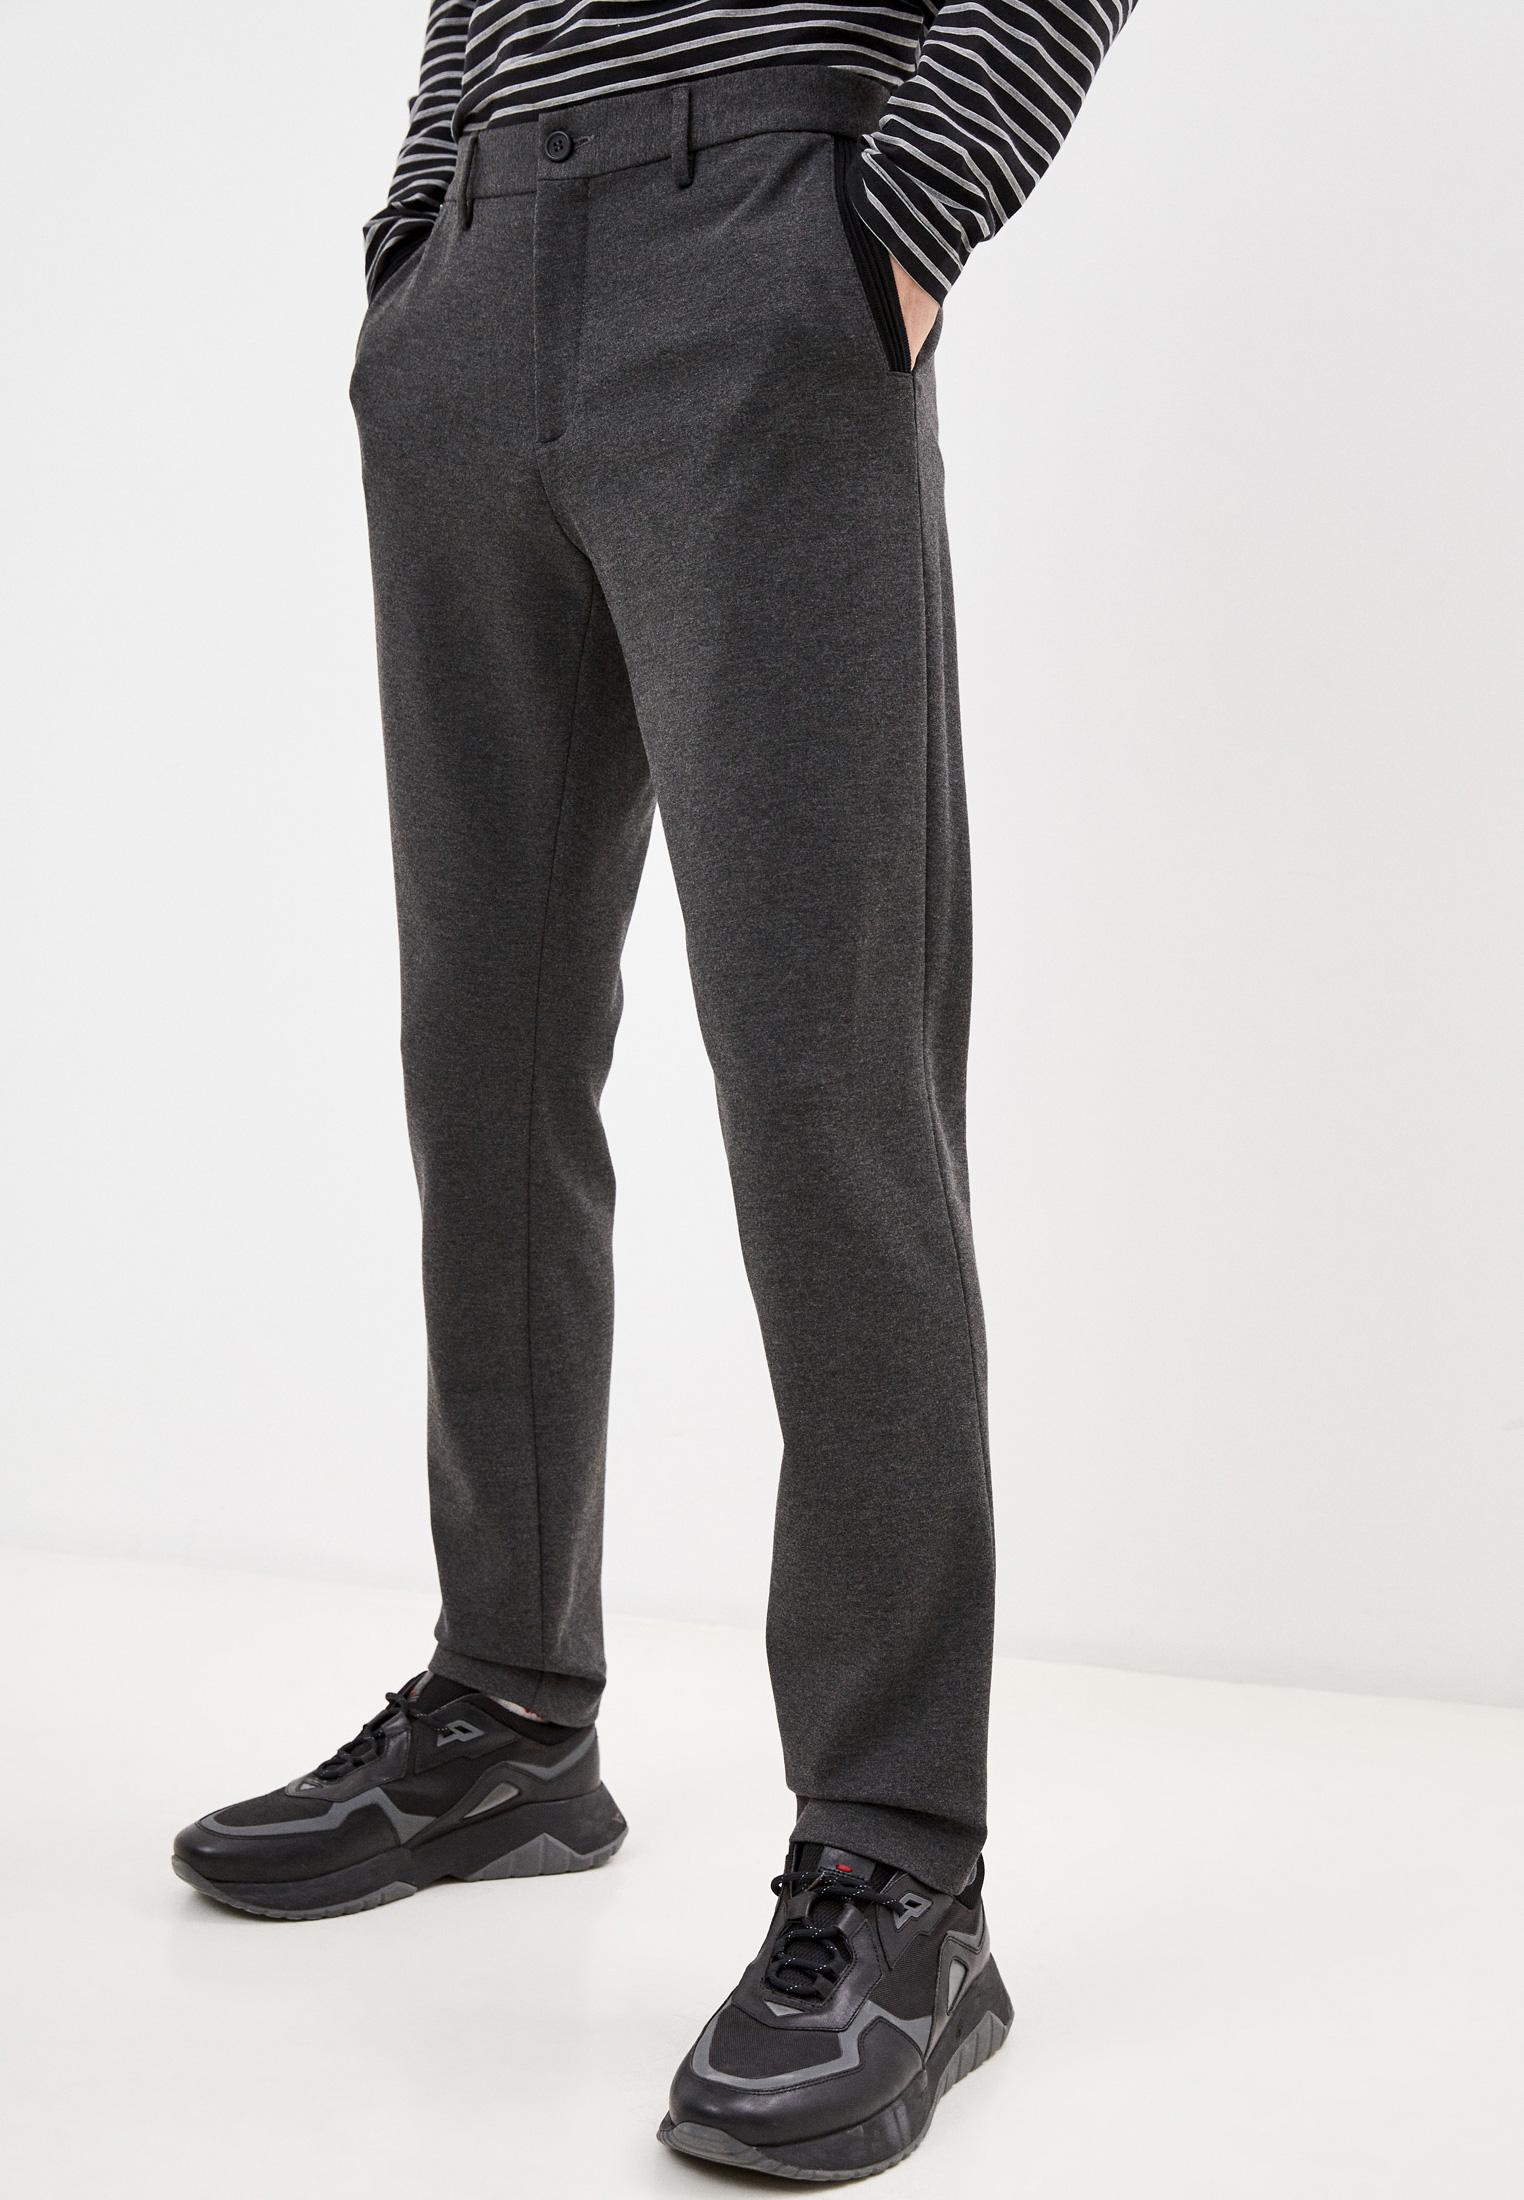 Мужские брюки Bikkembergs (Биккембергс) C 1 061 80 E 1969